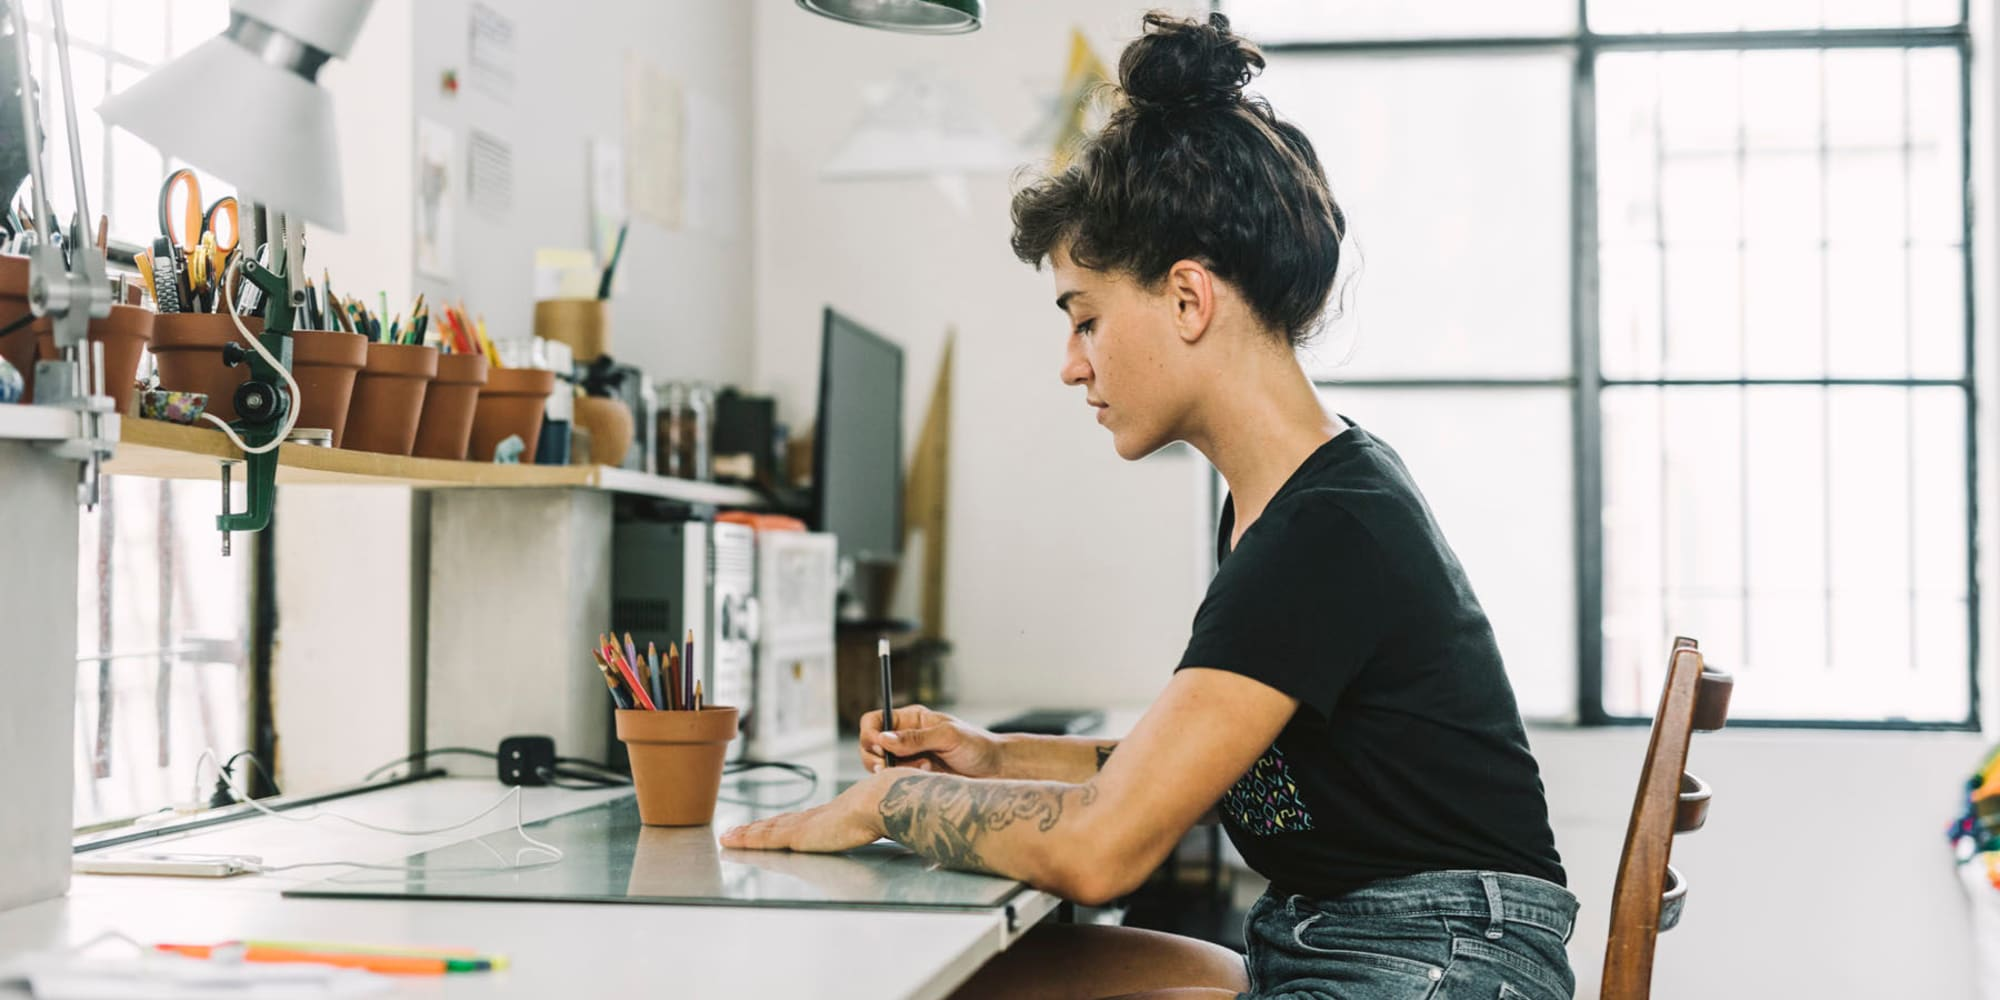 Student in a design class near Mediterranean Village in West Hollywood, California